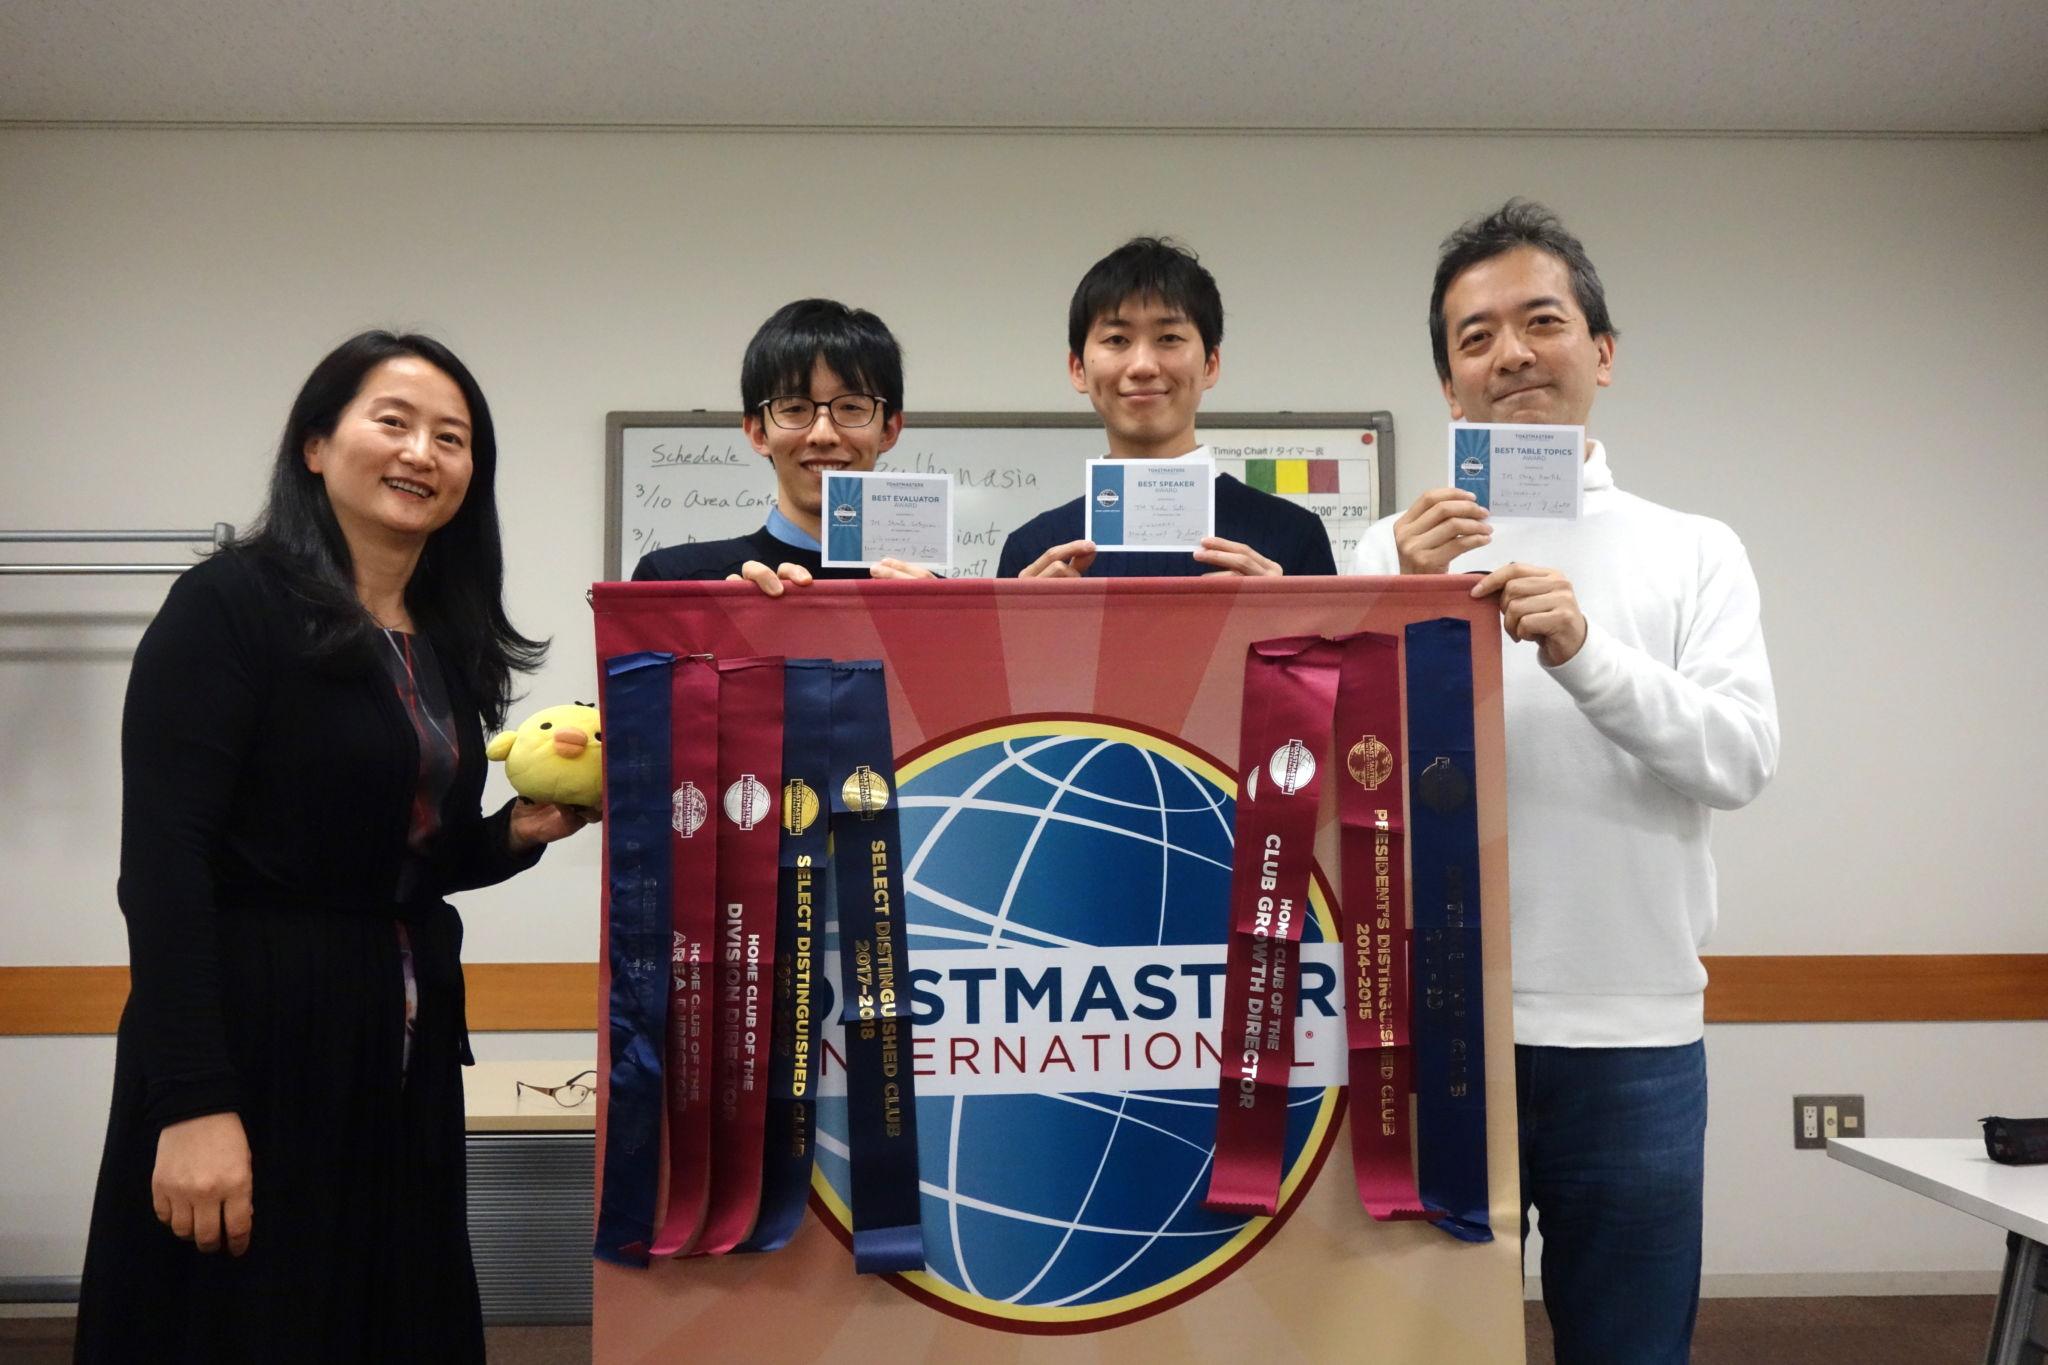 Visionaries Toastmasters club #212 award session